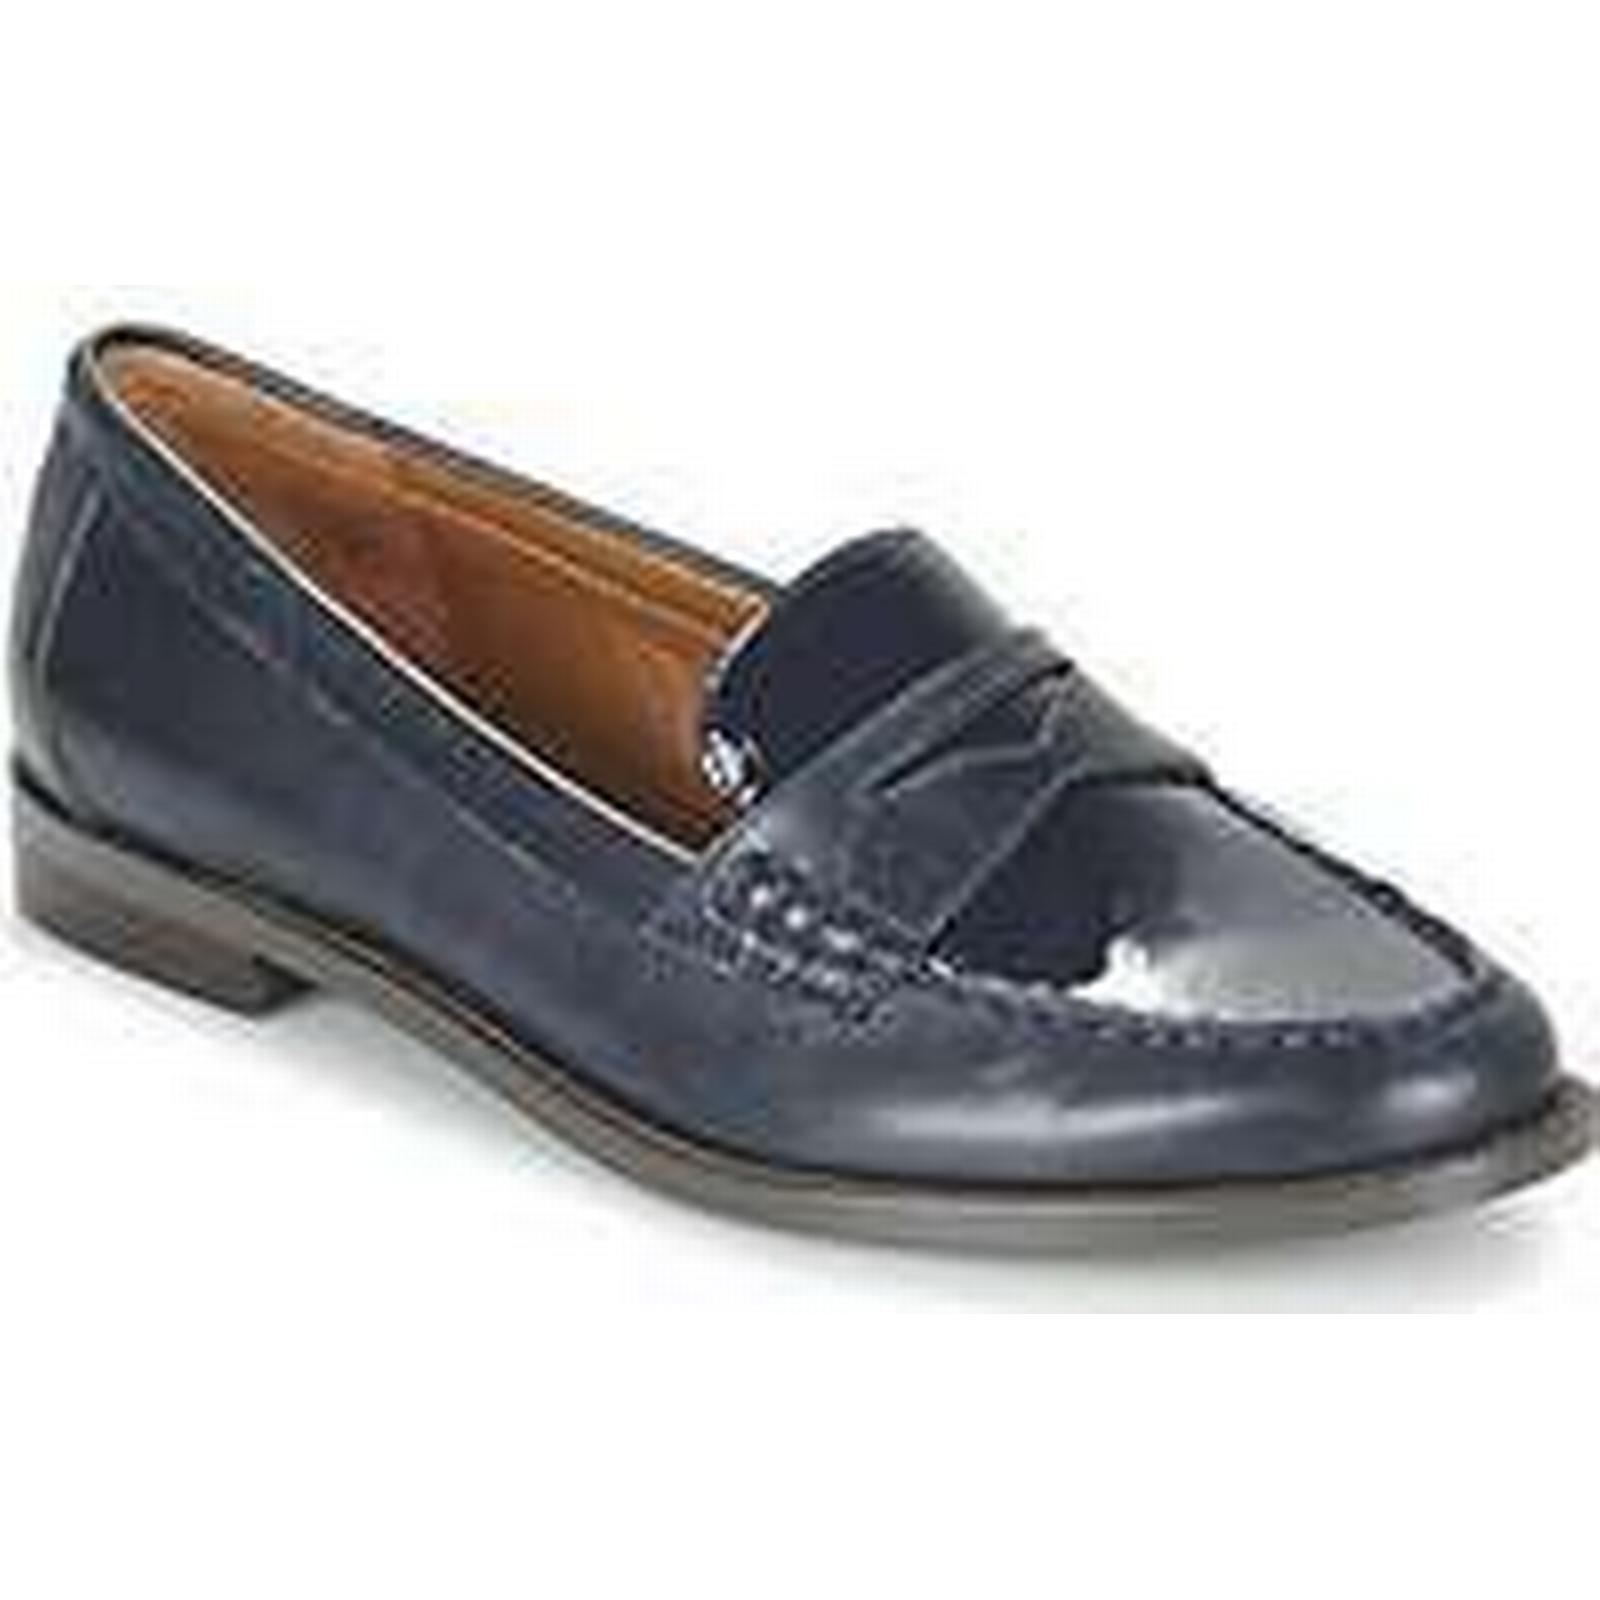 Spartoo.co.uk Lauren Ralph Lauren BARRETT SHOE Casual TAILORED women's Loafers / Casual SHOE Shoes in Blue 899023